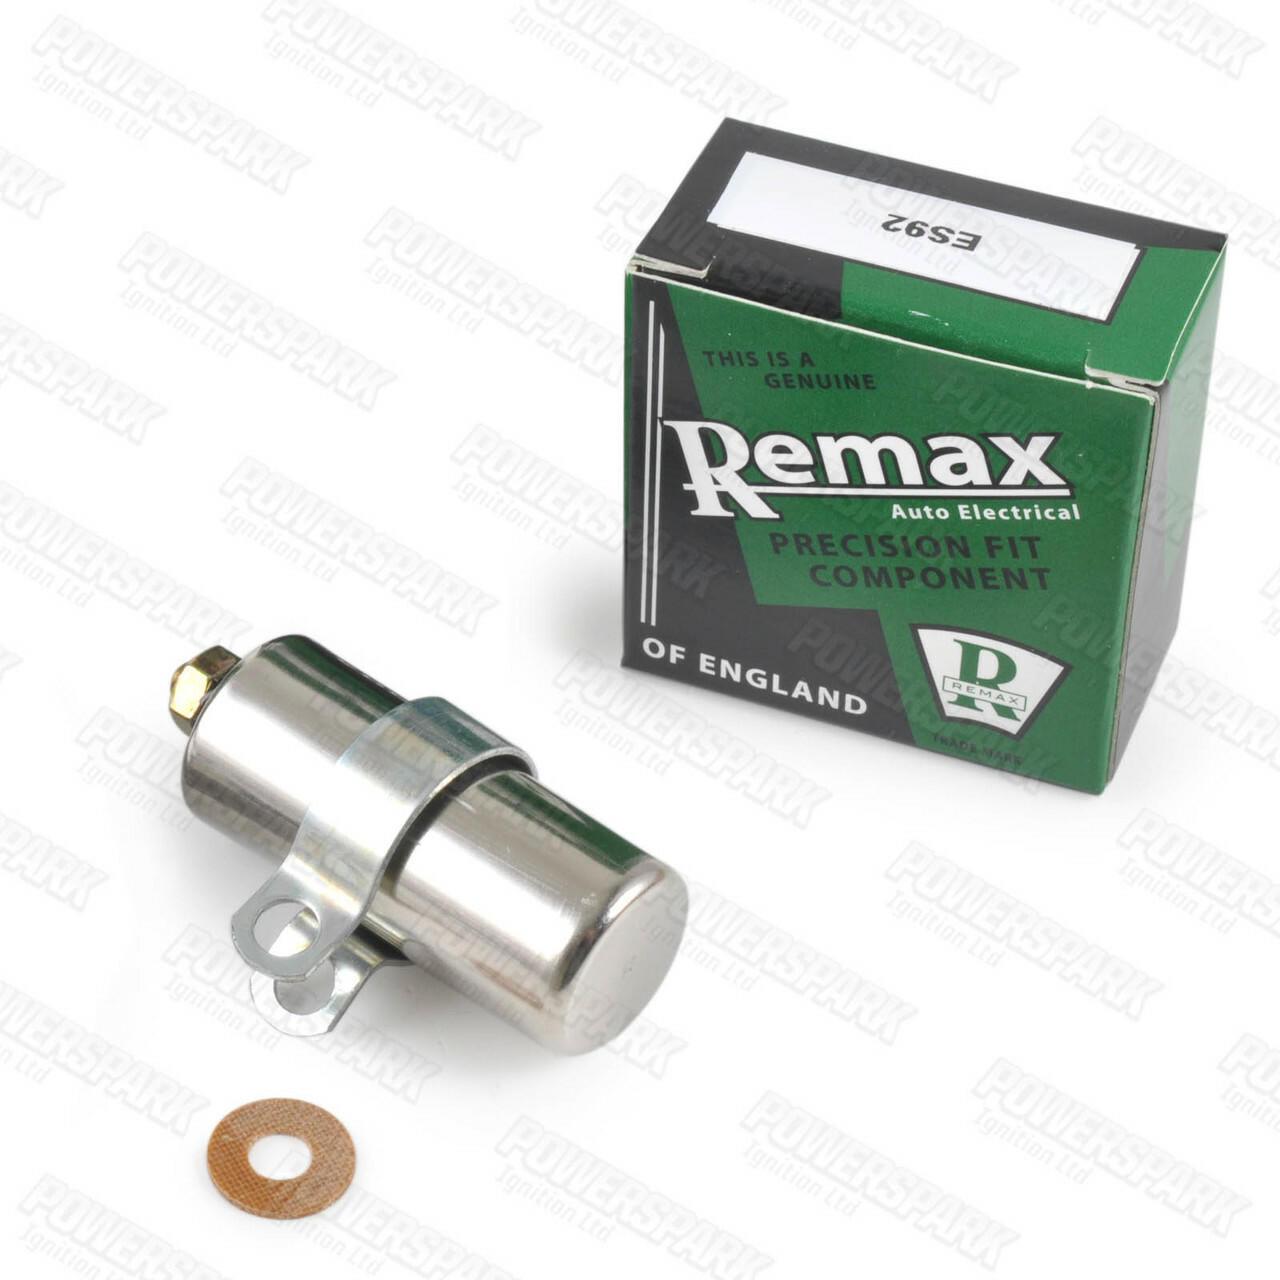 Remax Remax Lucas DM DK DX Distributor Condensor ES92